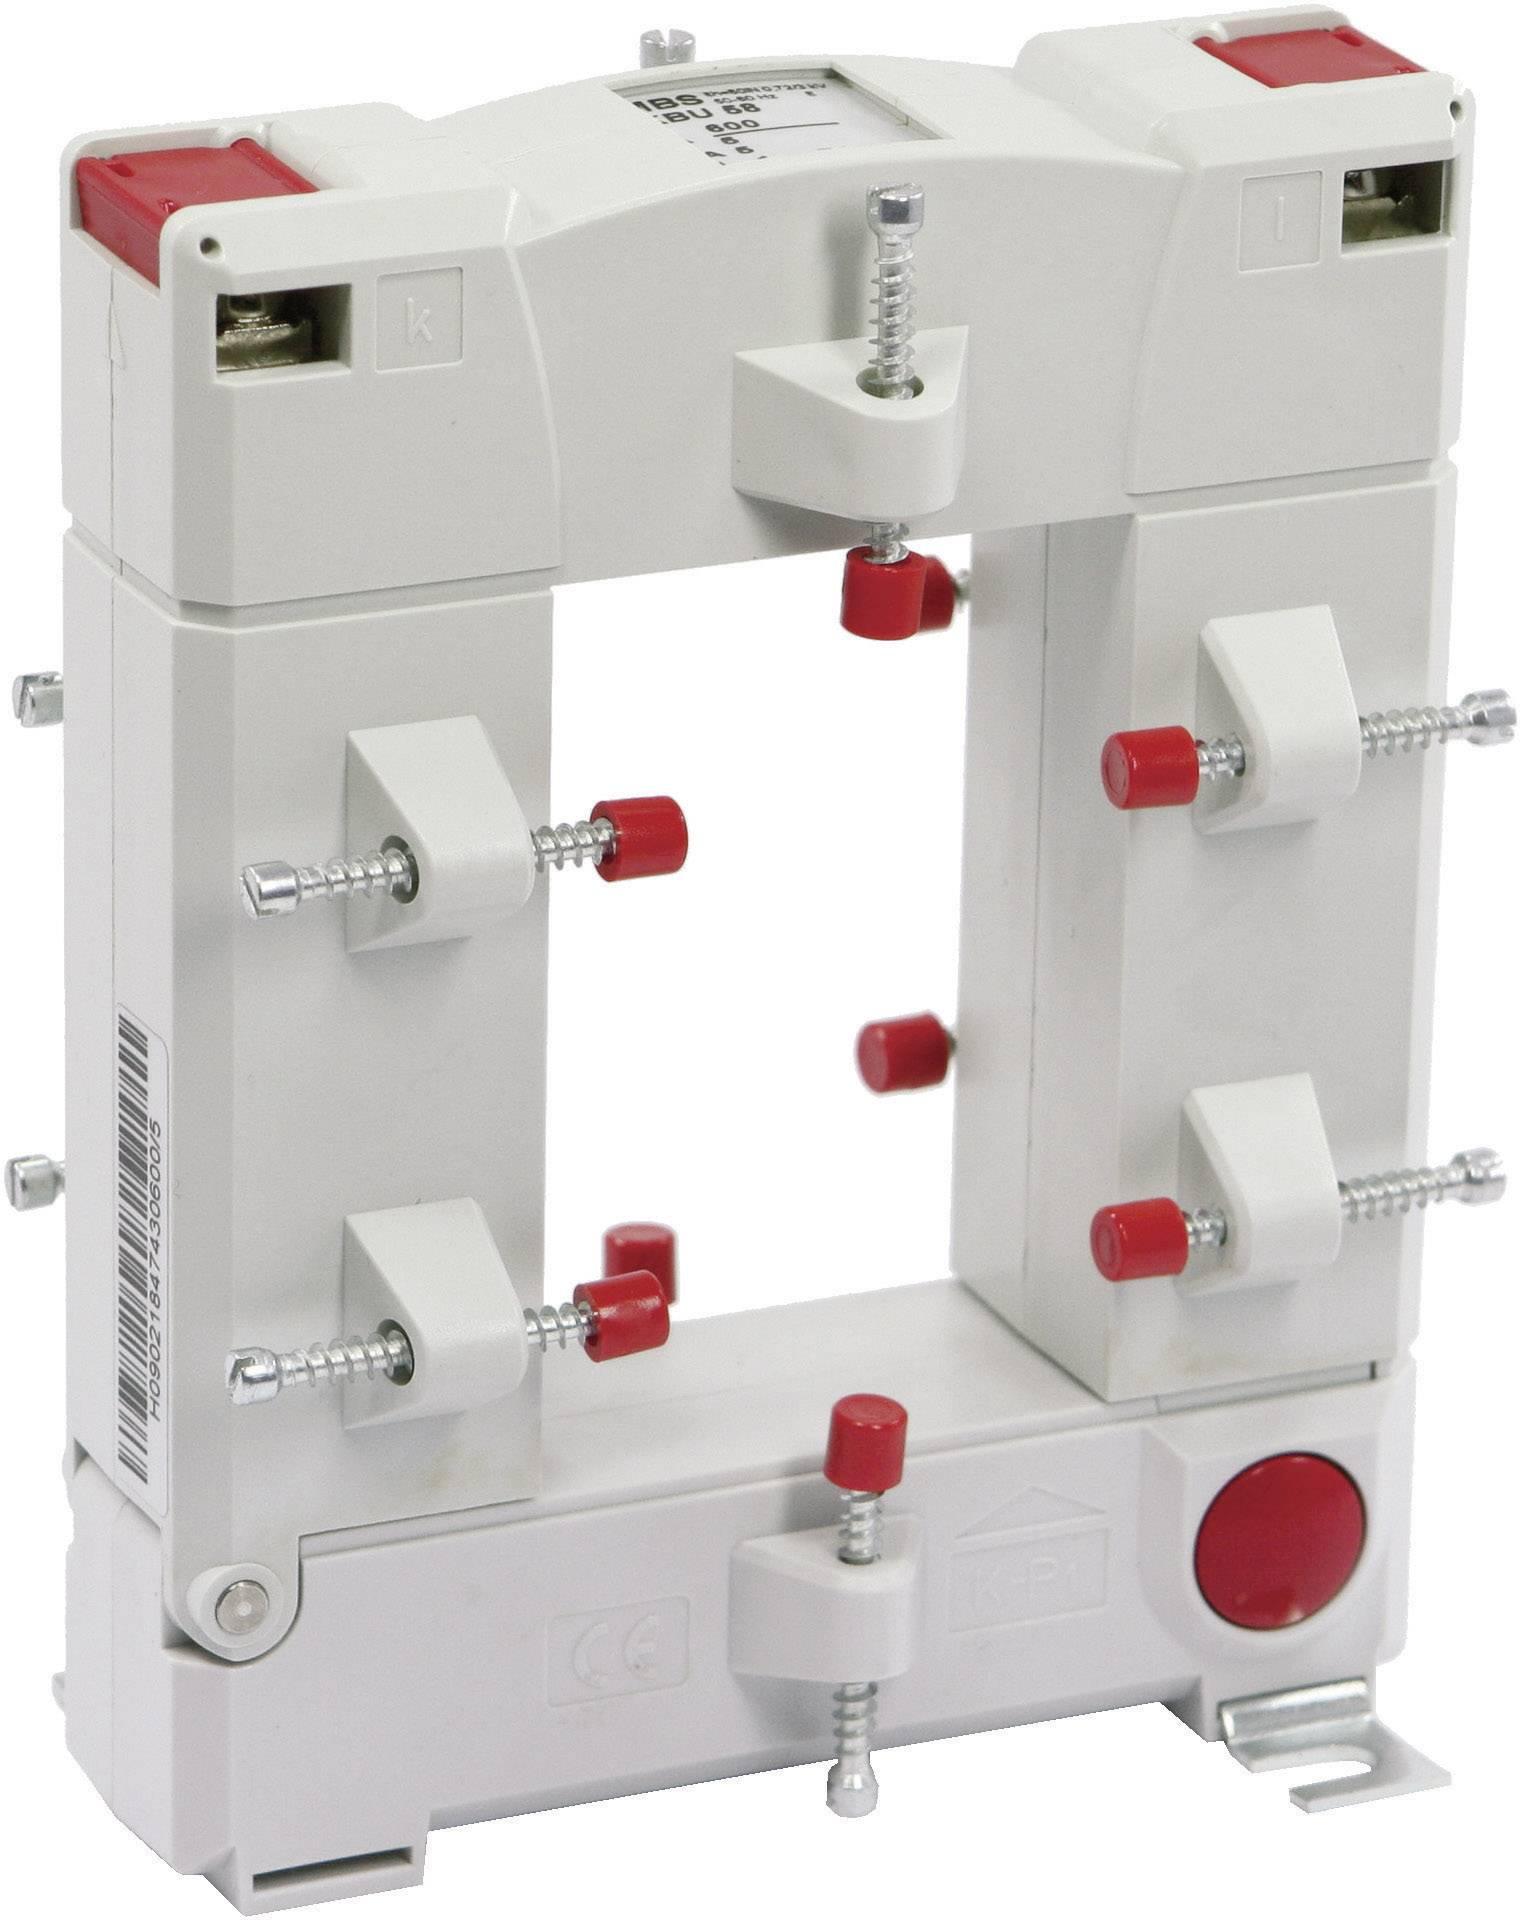 Zásuvný merací transformátor prúdu MBS KBU58 500/5A 5VA KL.1